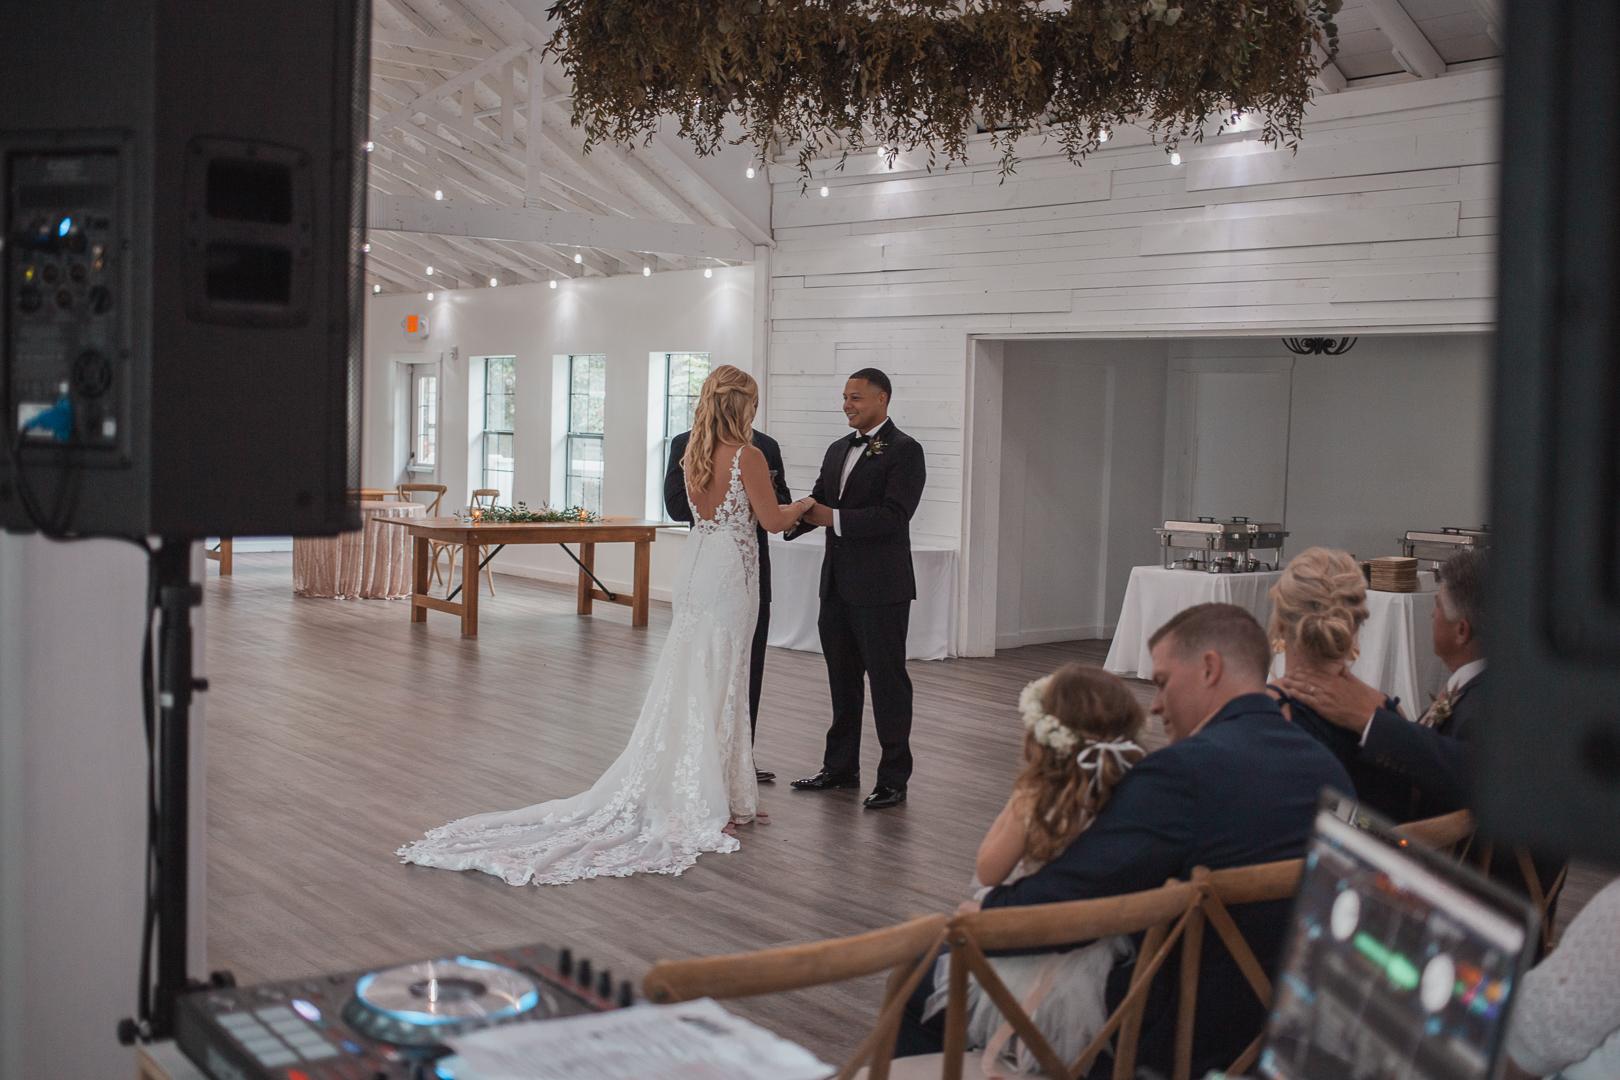 Aloson & Oree's Wedding (8-24-19) Edited5884.jpg